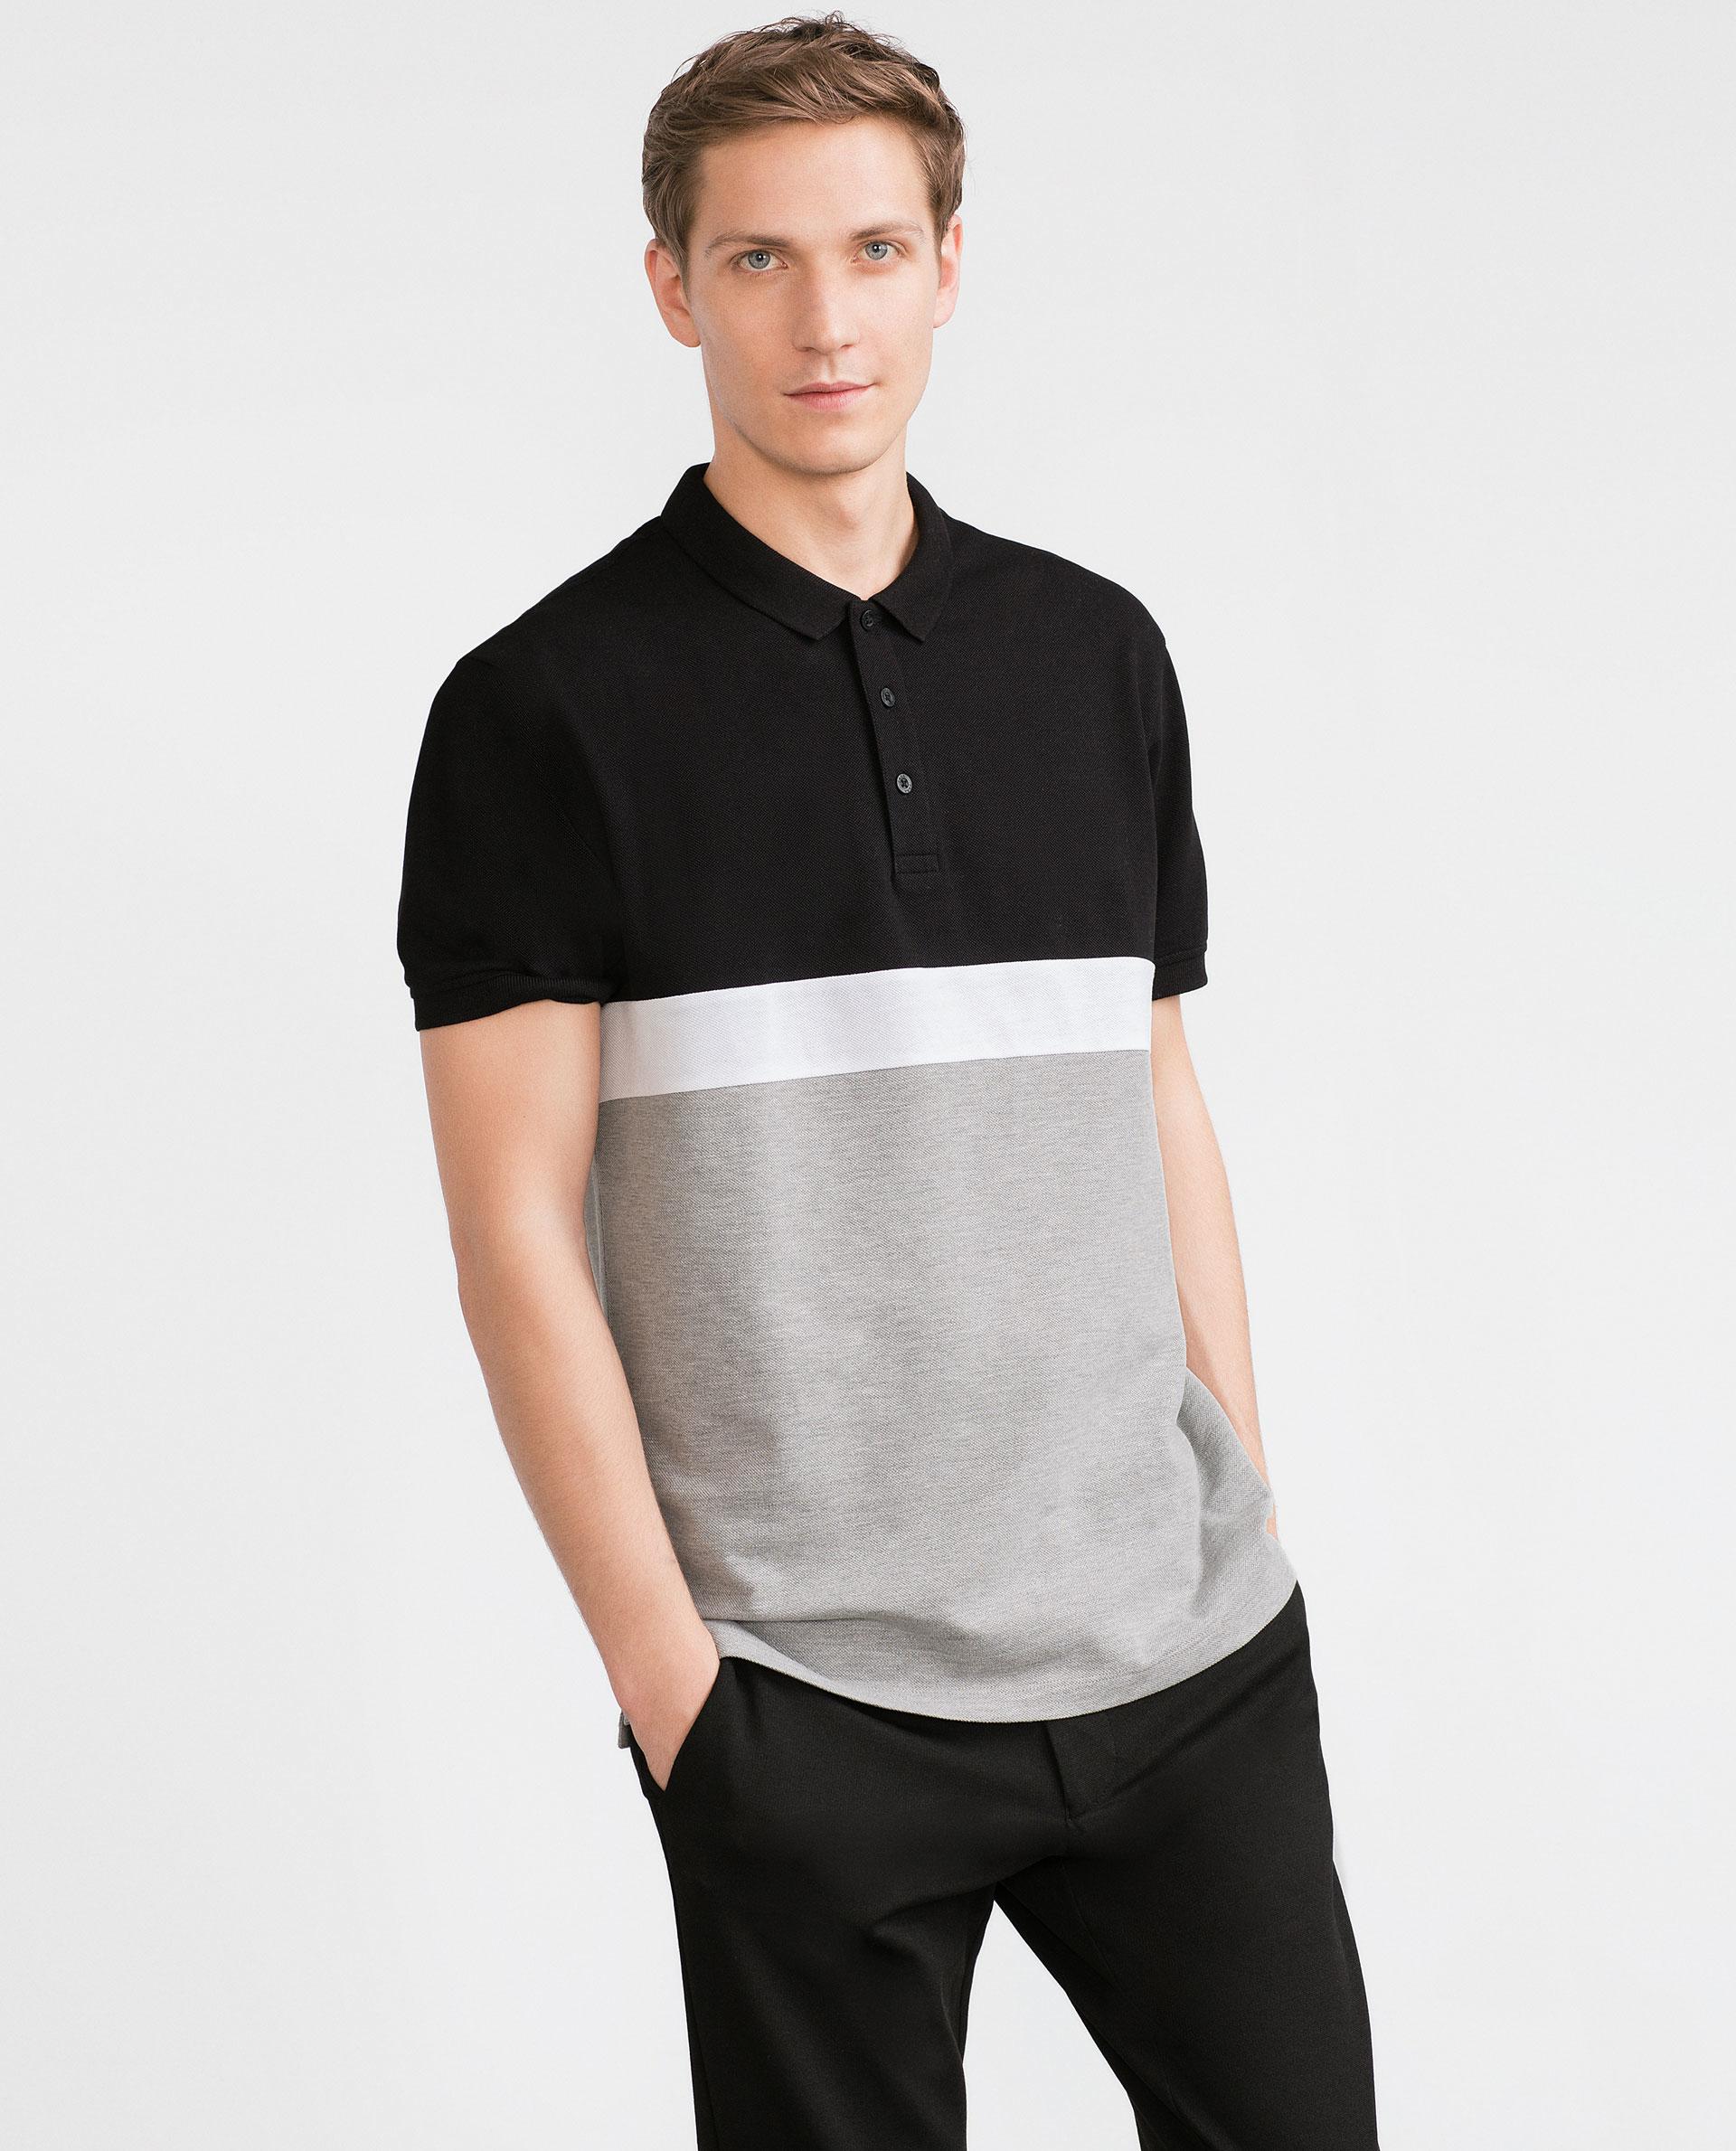 Zara piqu polo shirt in black for men lyst for Zara mens shirts sale